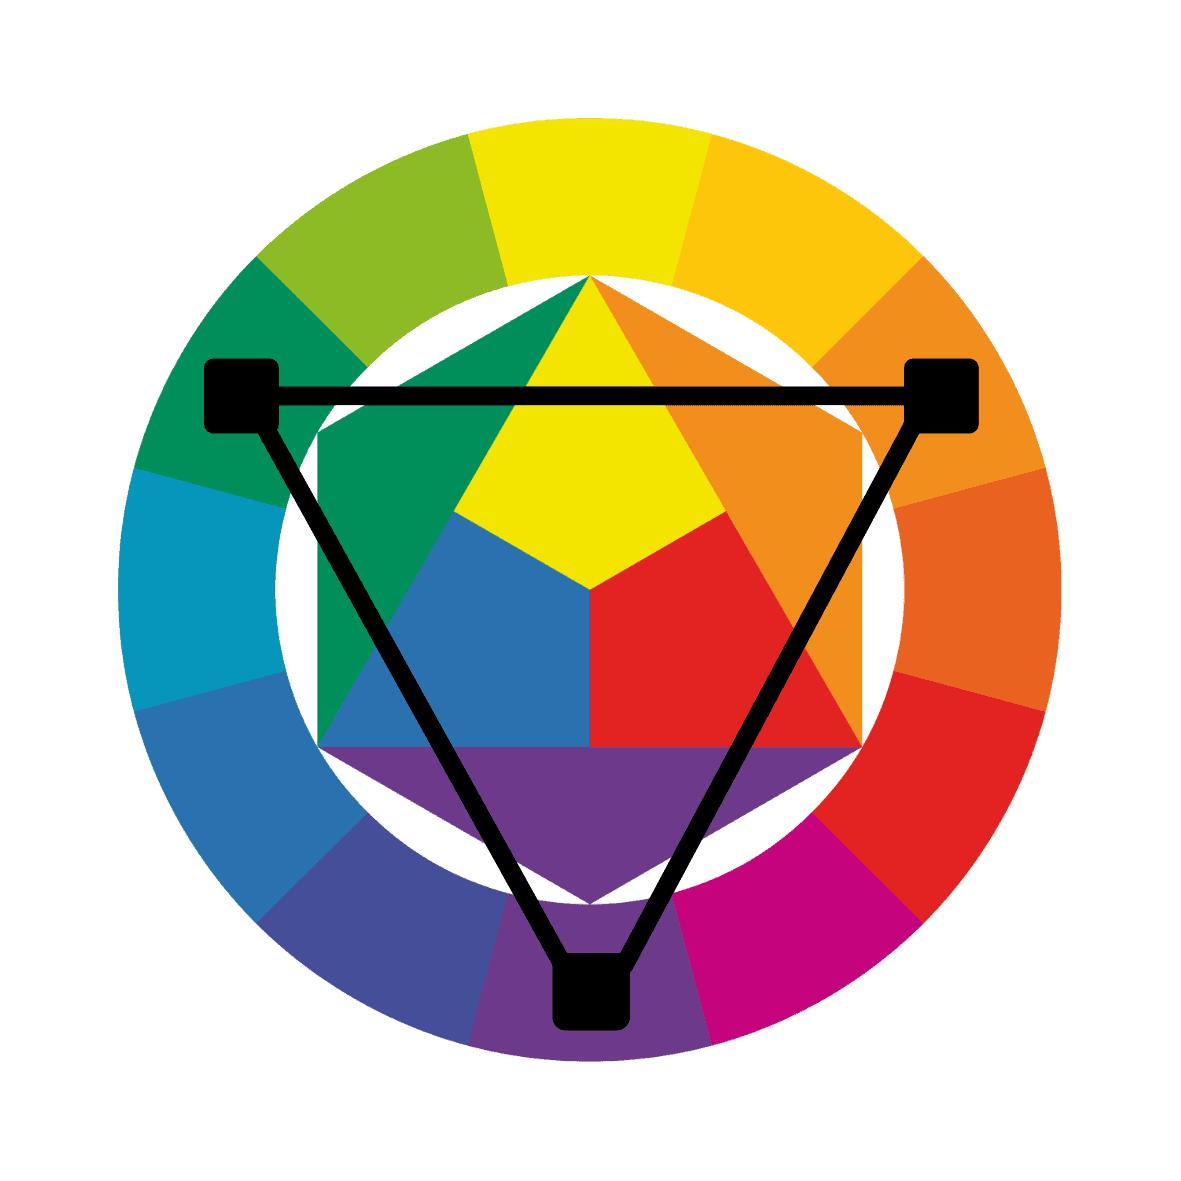 triadic color scheme